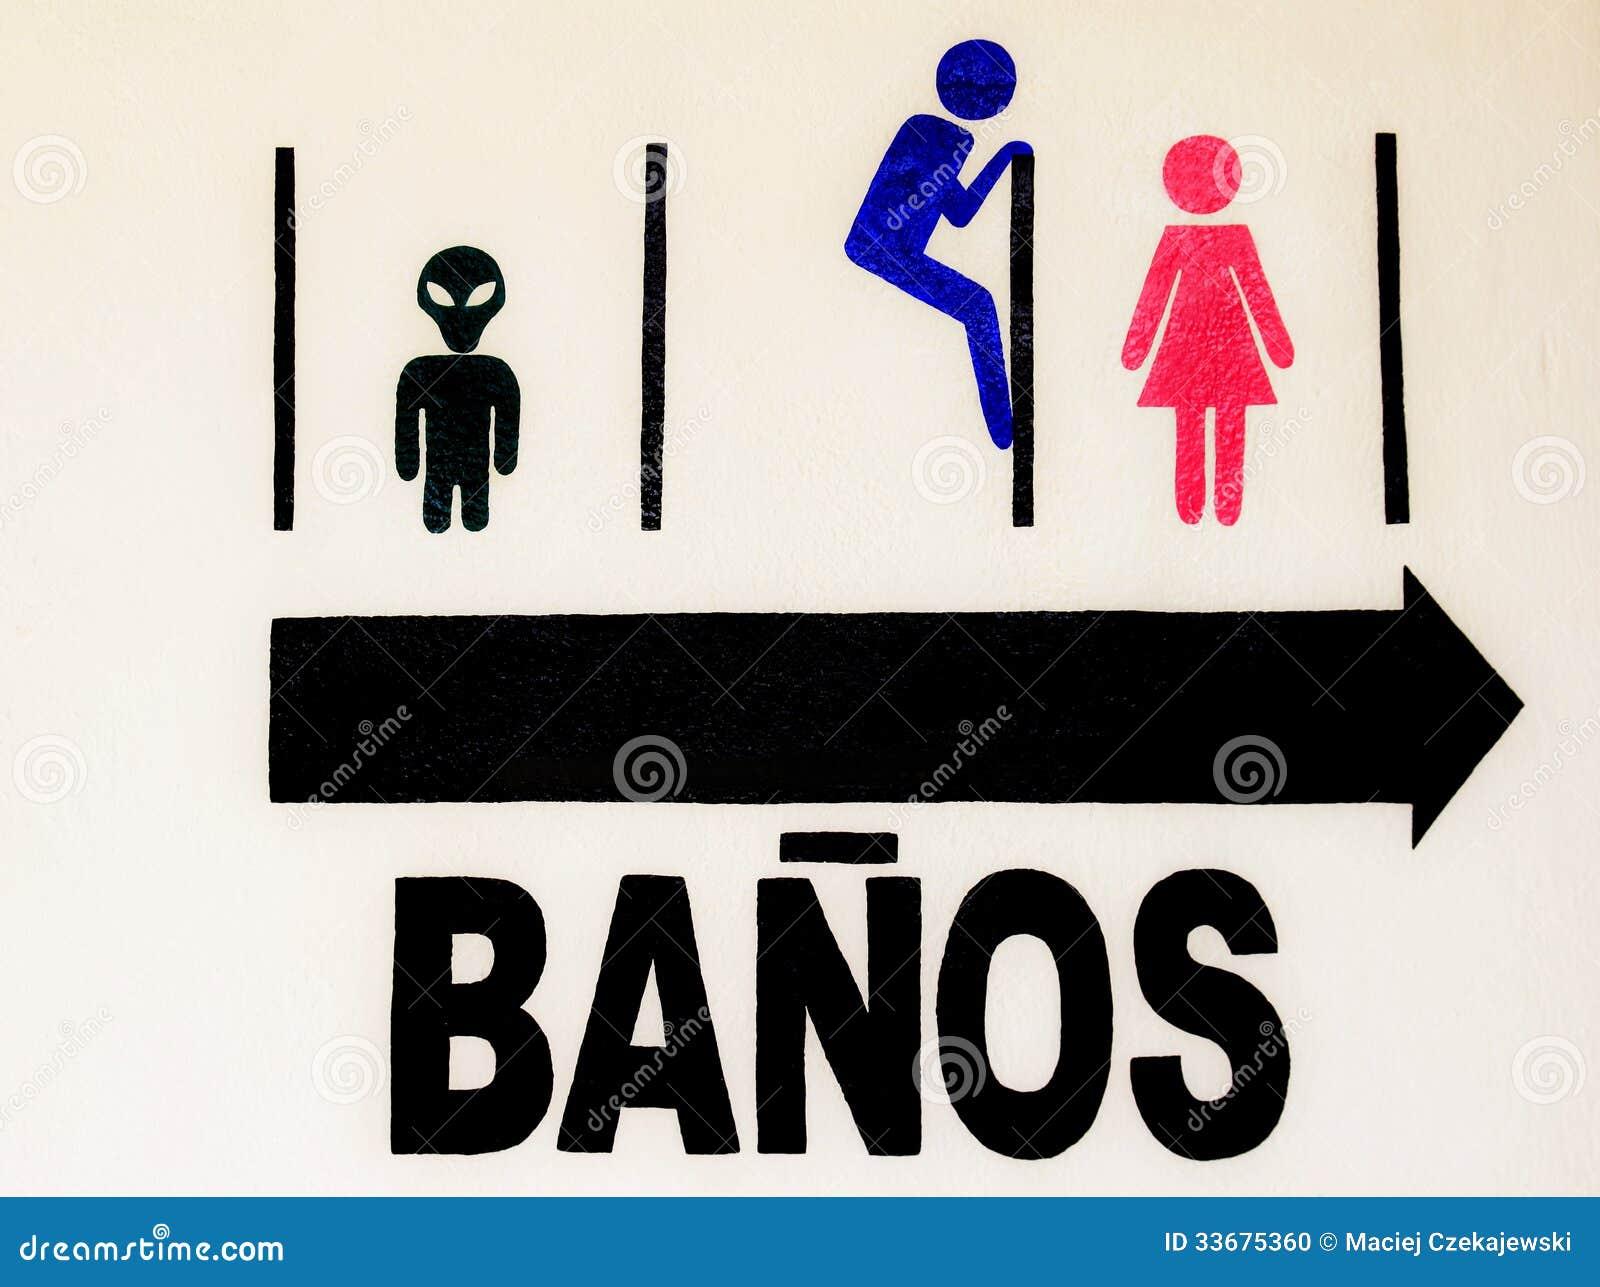 Bathroom Signs In Spanish